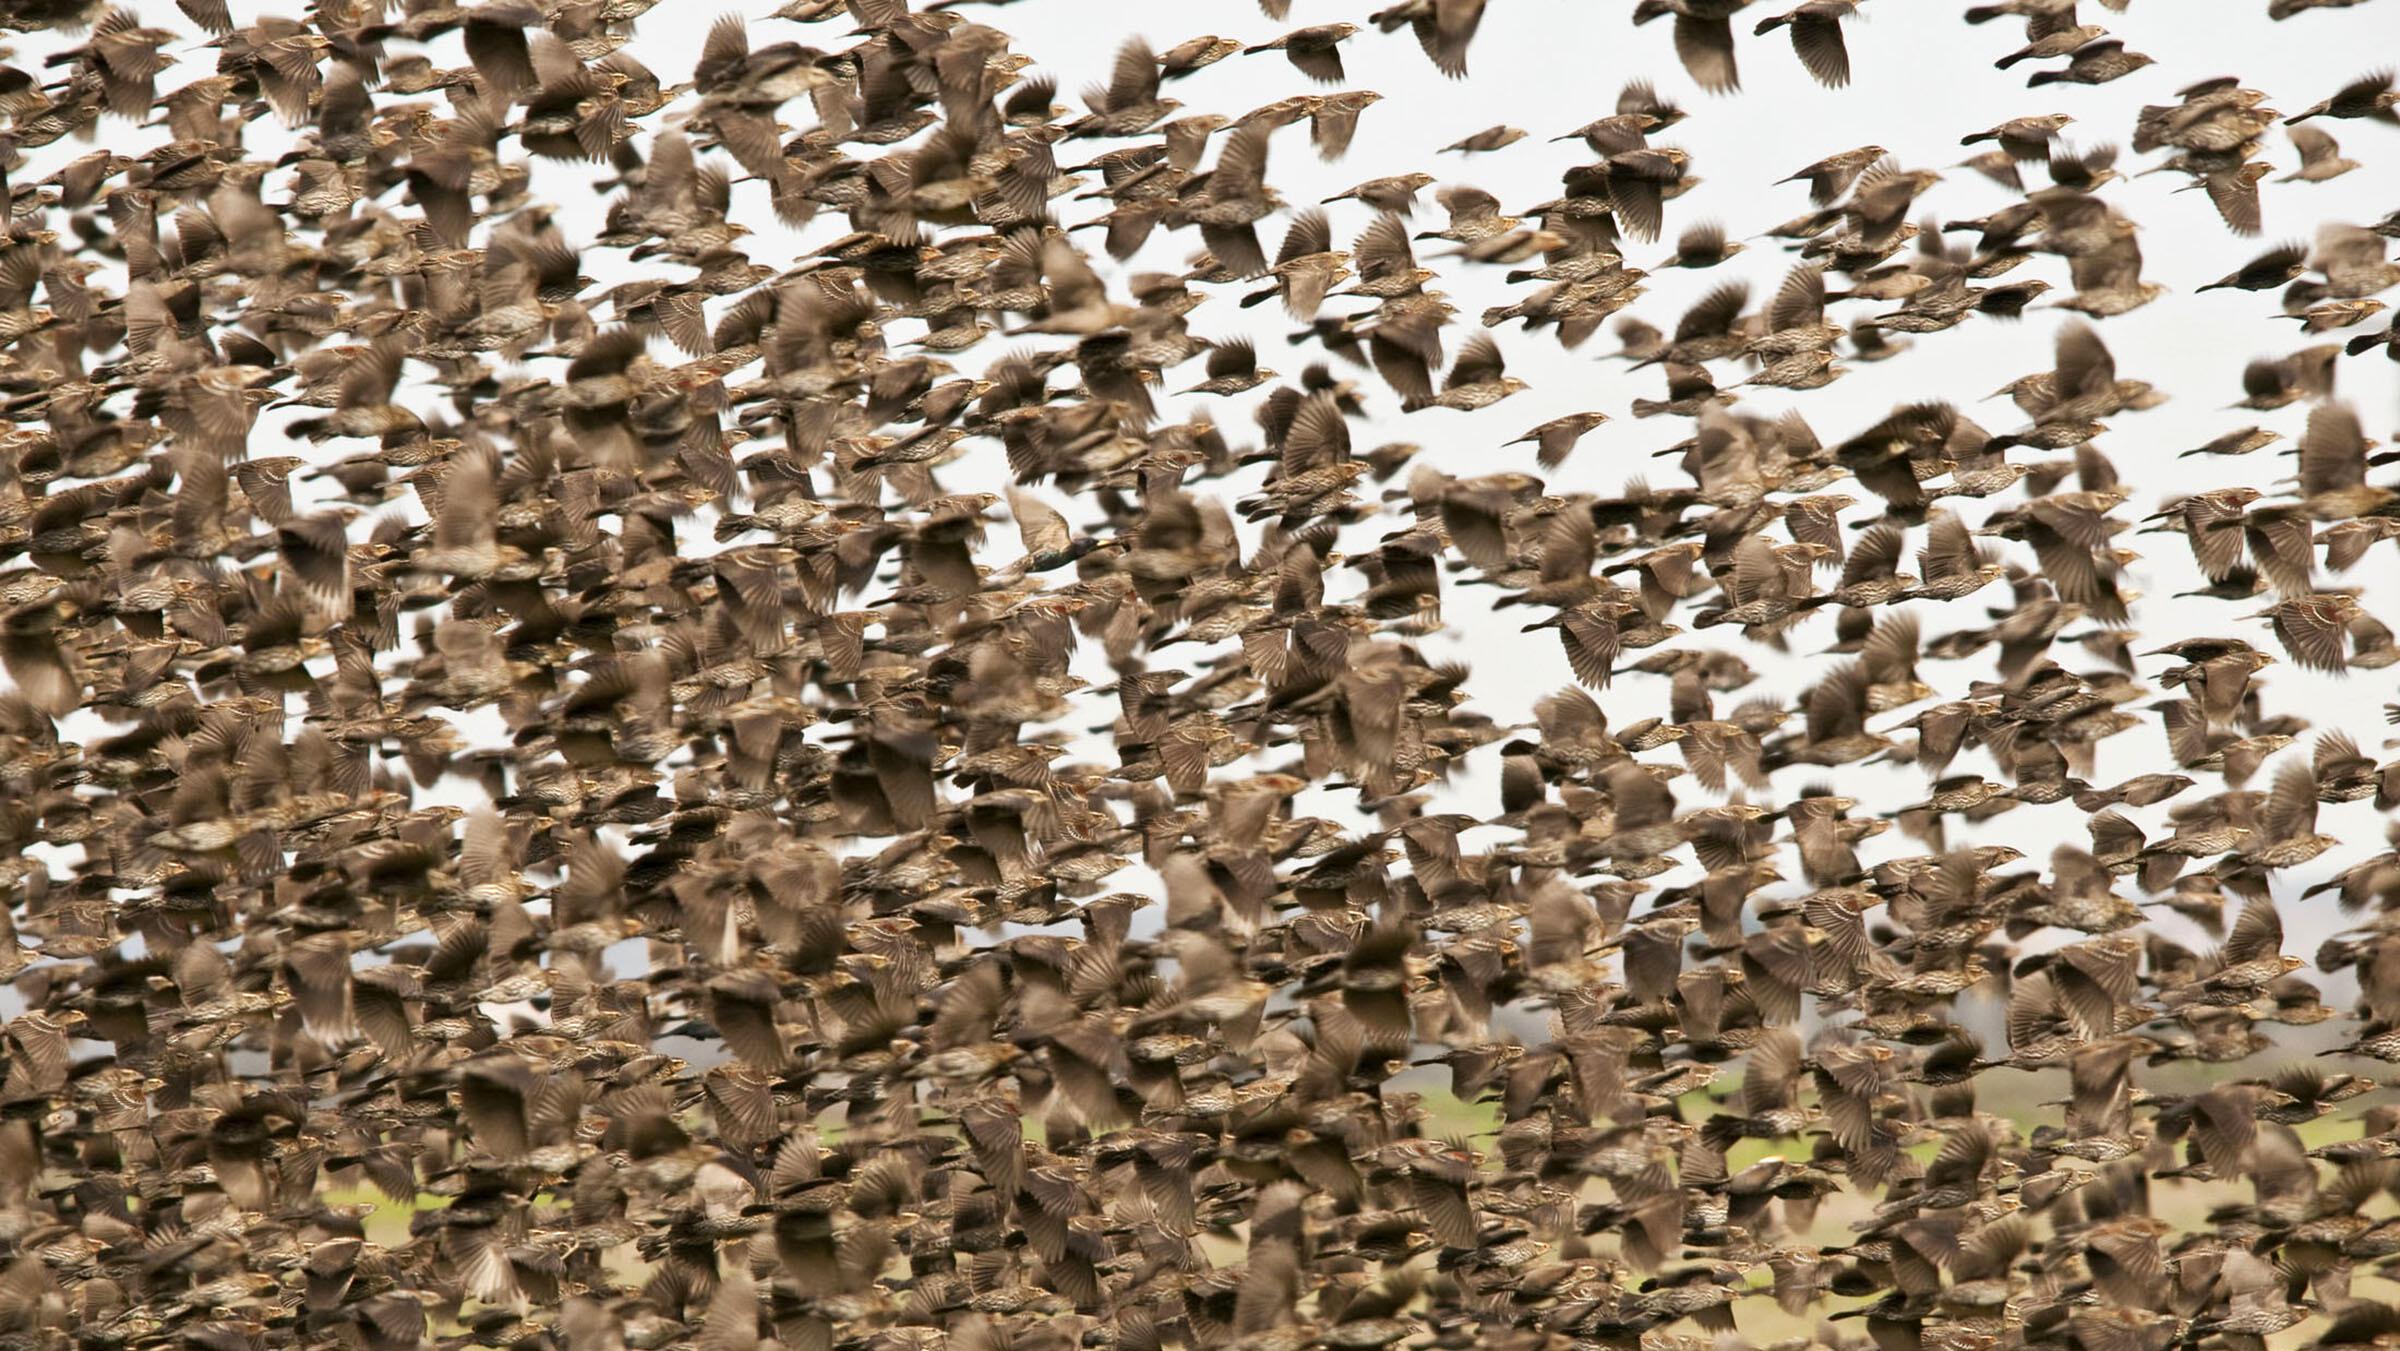 Redwinged_Blackbirds_Dennis_Demcheck_Great_Backyard_Birdcount_participant